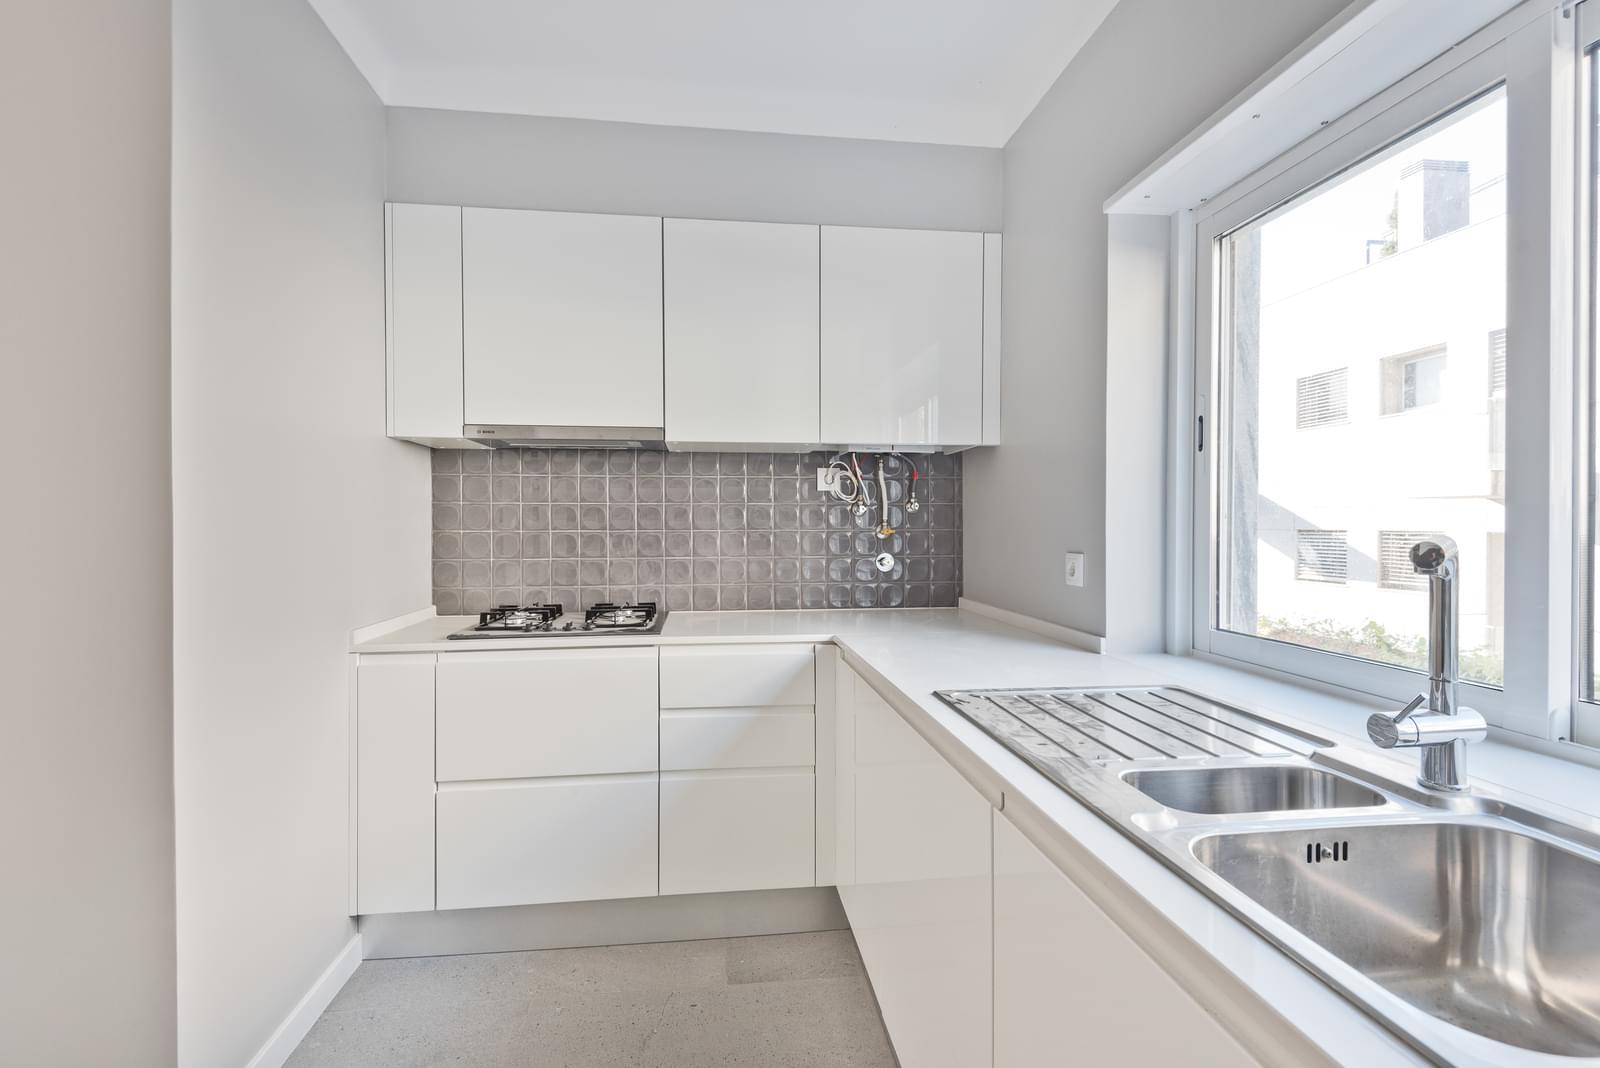 pf18908-apartamento-t2-cascais-f892ccb4-555d-4c5f-8f1c-2e977628a073